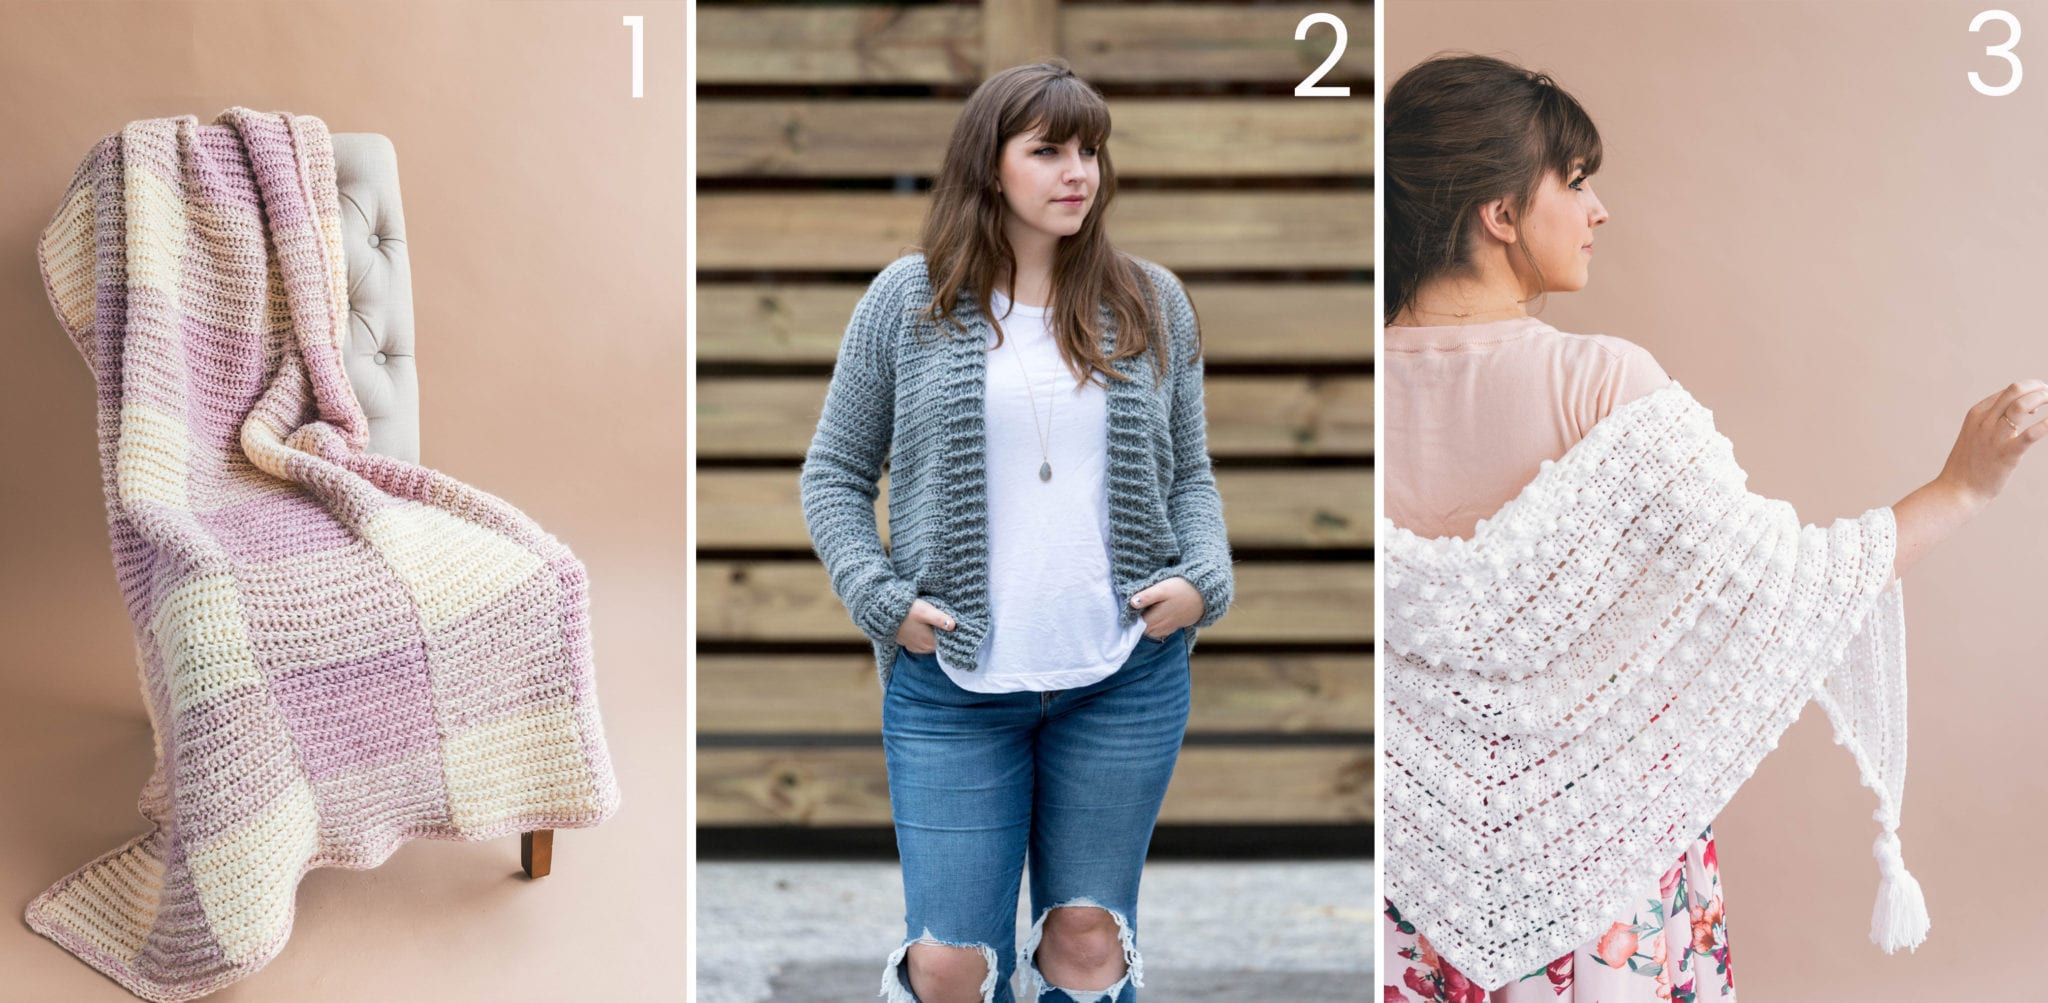 4acd08fba1f88 Crochet Homemaker Gingham Throw   2. Crochet Everyday Cardigan   3. Crochet  Le Nuage Wrap Triangle Scarf